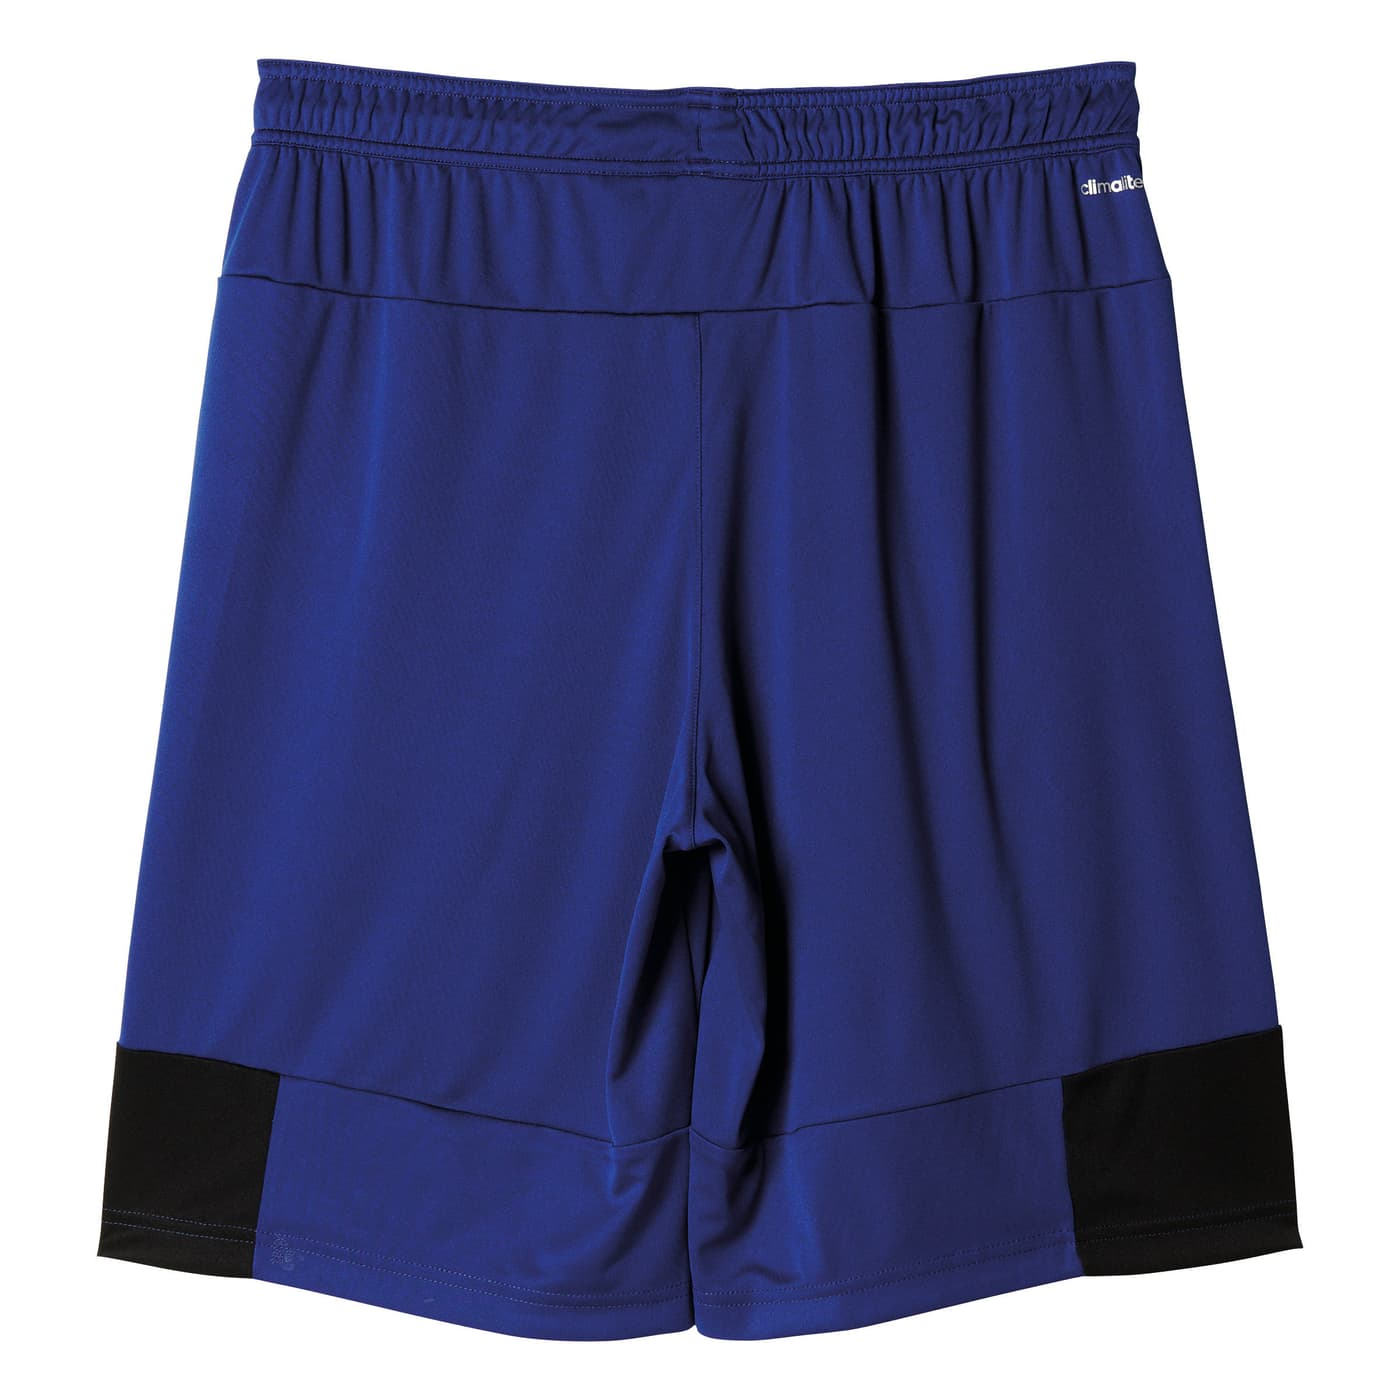 adidas herren shorts swat short 2 migros. Black Bedroom Furniture Sets. Home Design Ideas